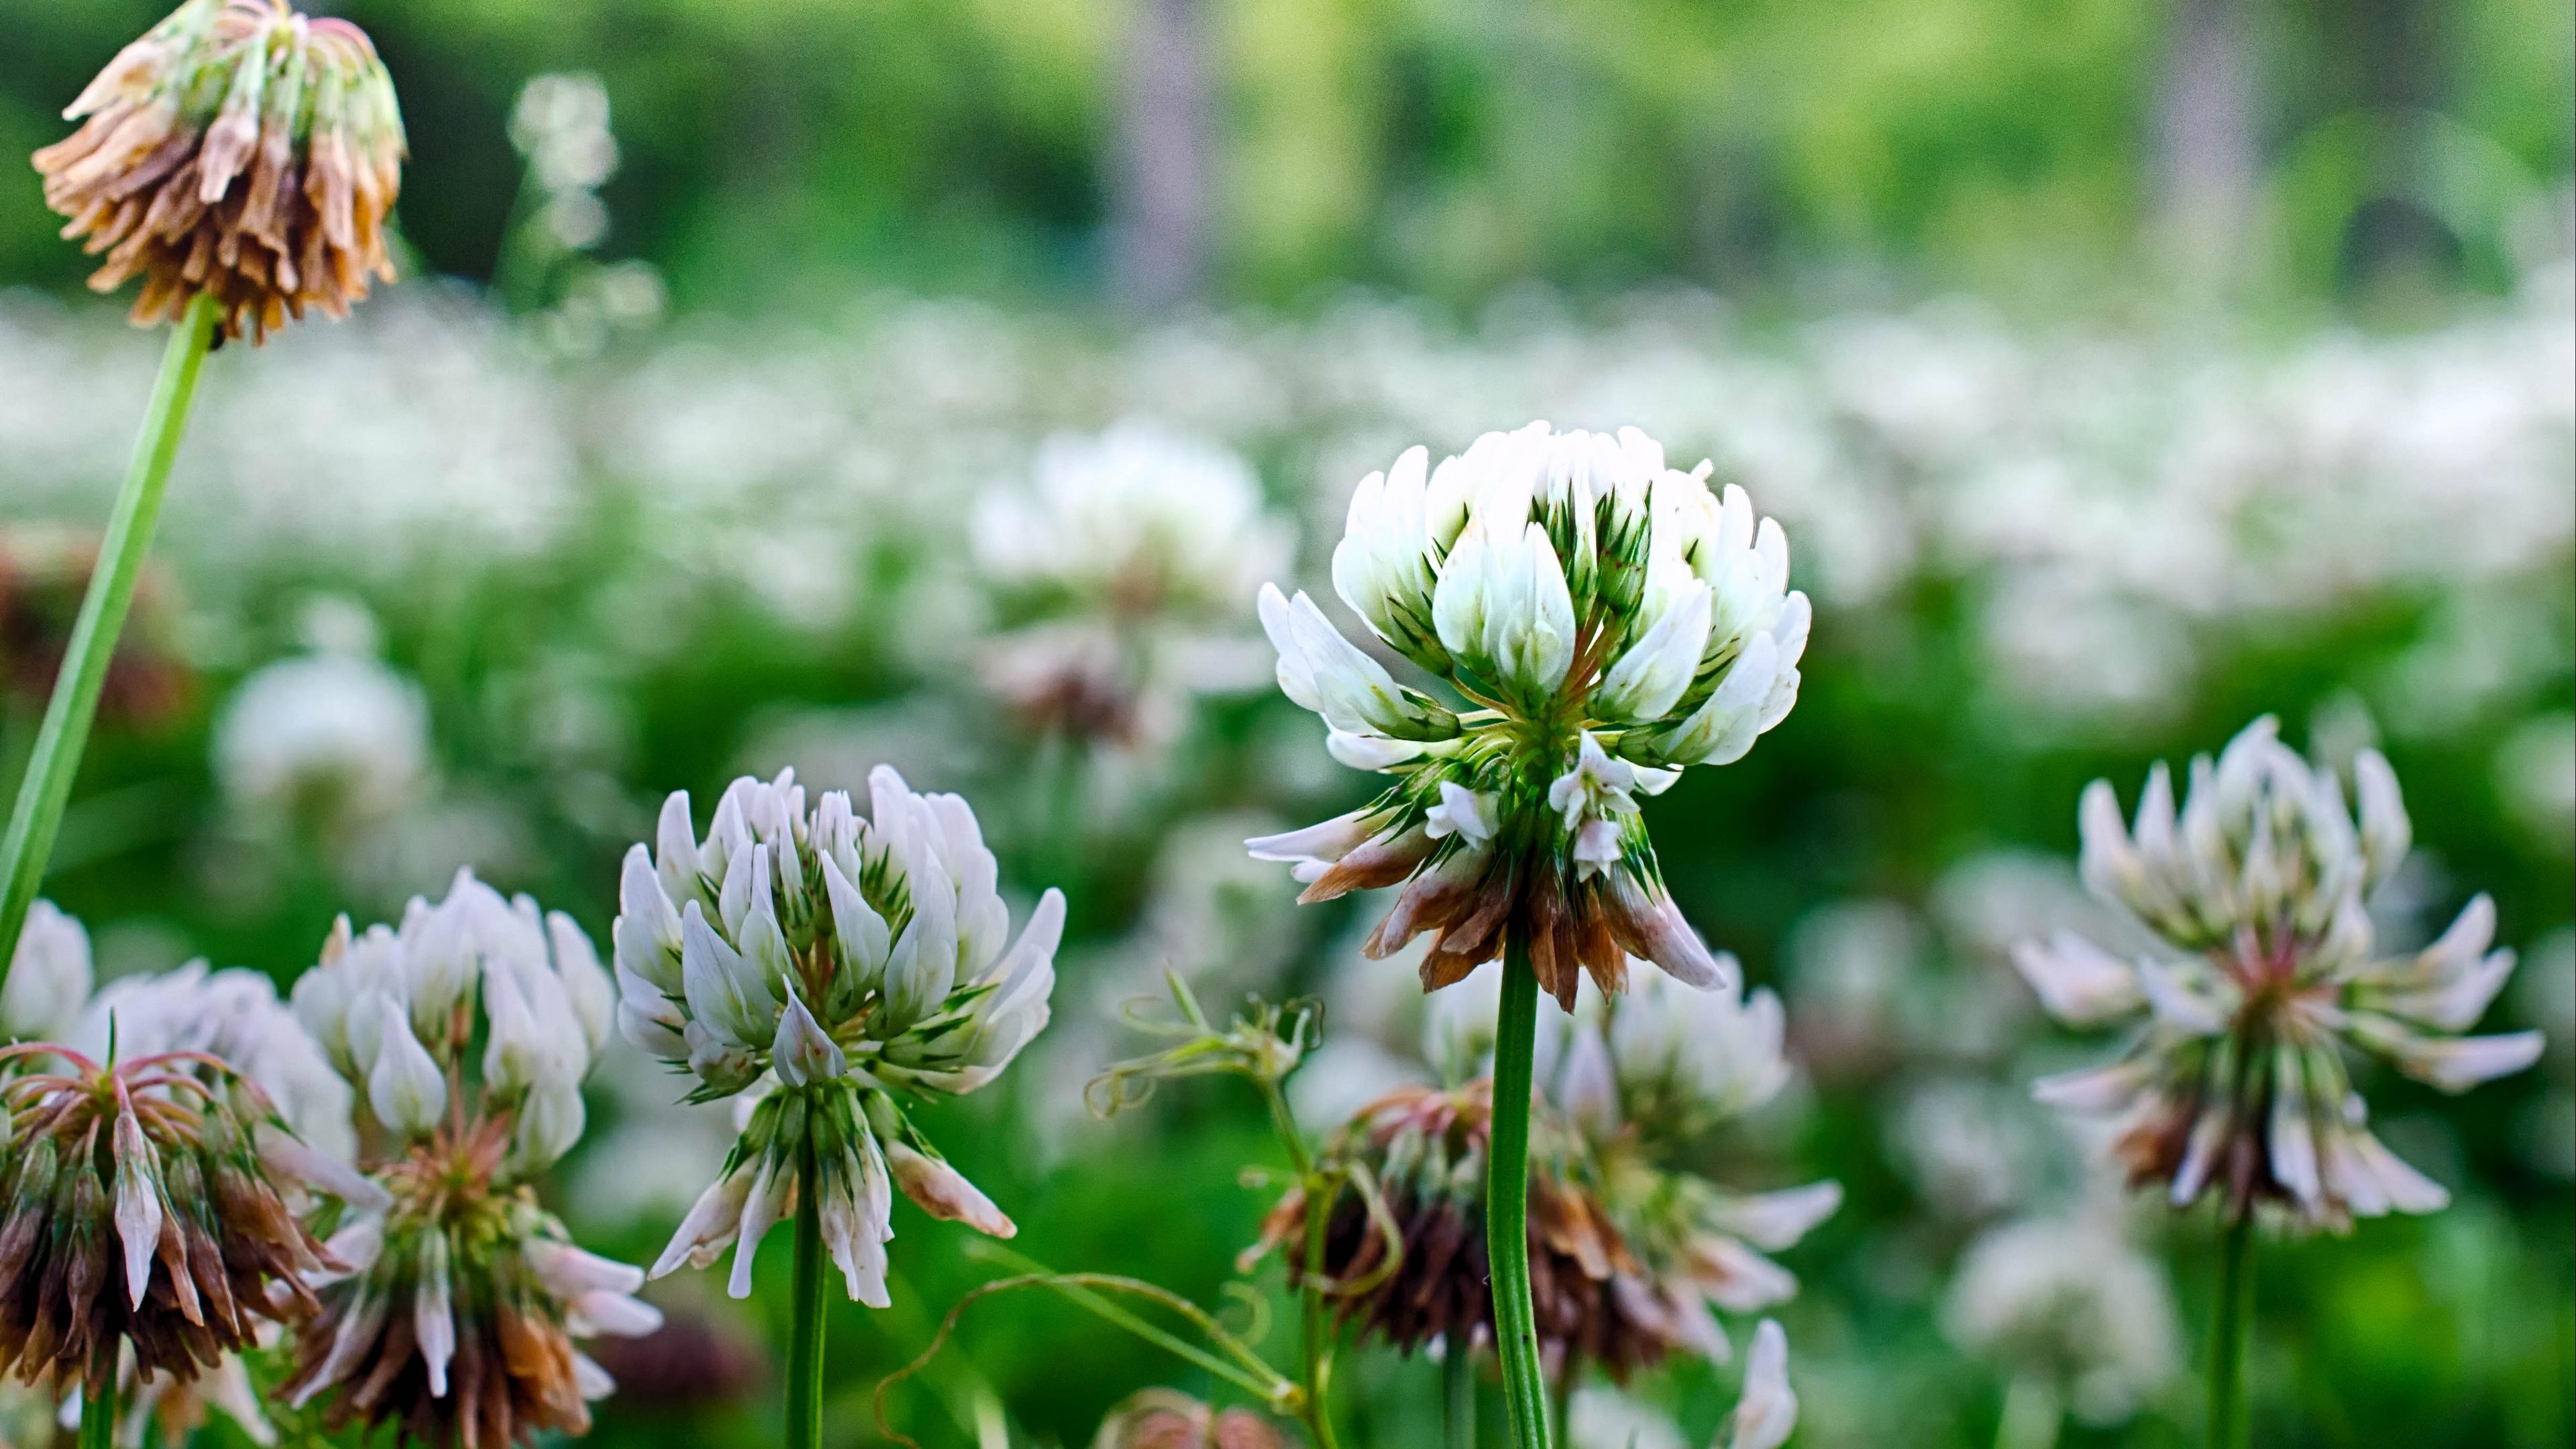 clover flowers plant 4k 1540064721 - clover, flowers, plant 4k - Plant, Flowers, Clover